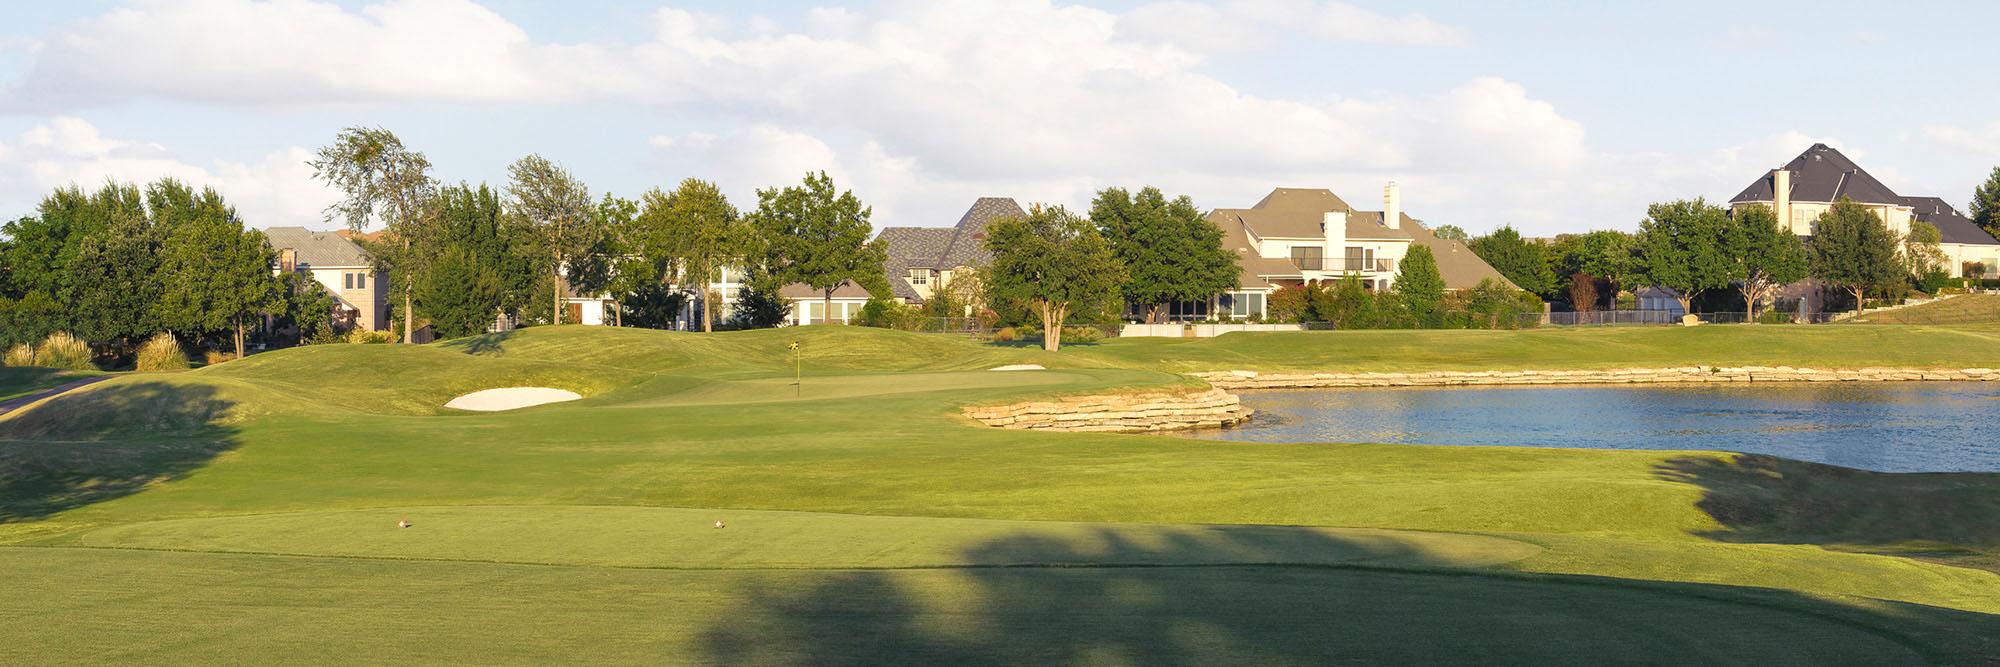 Golf Course Image - Mira Vista No. 7